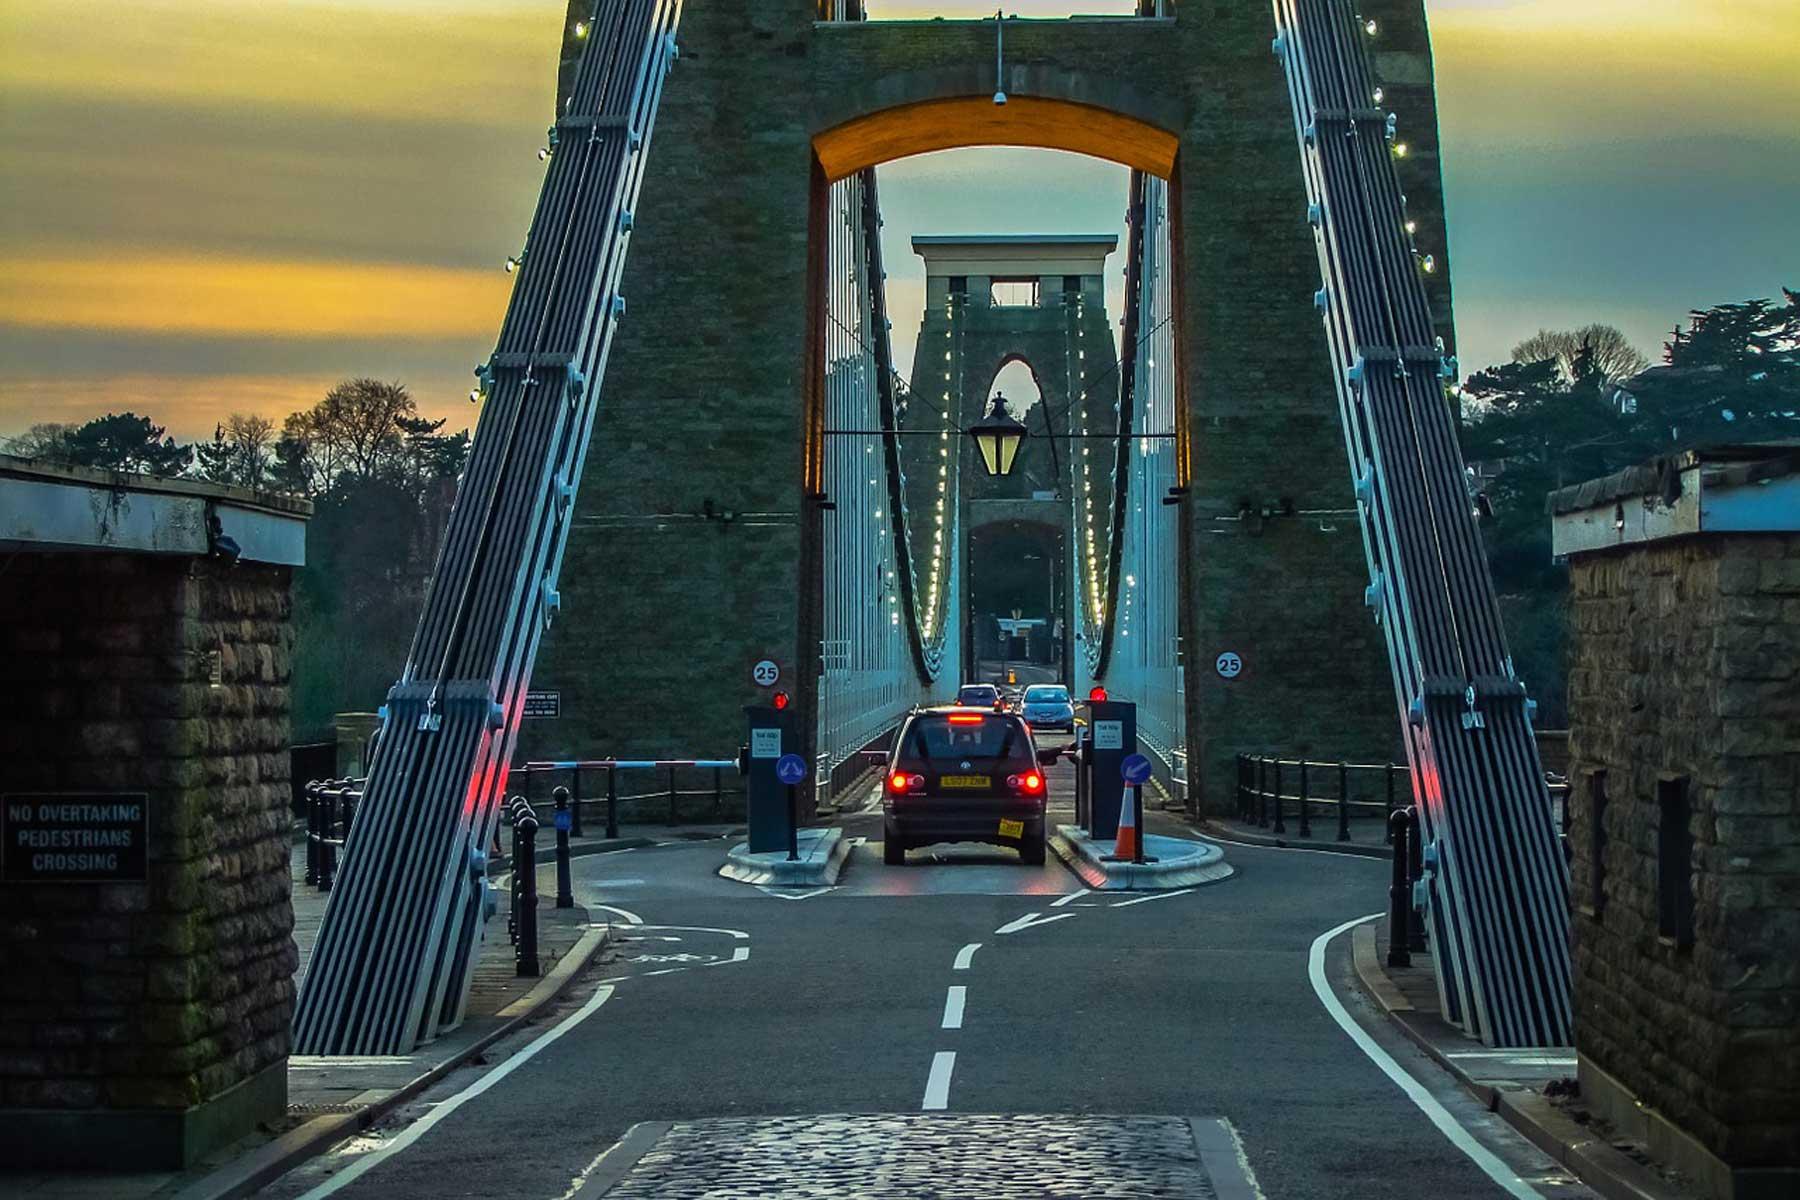 Bristol is Open